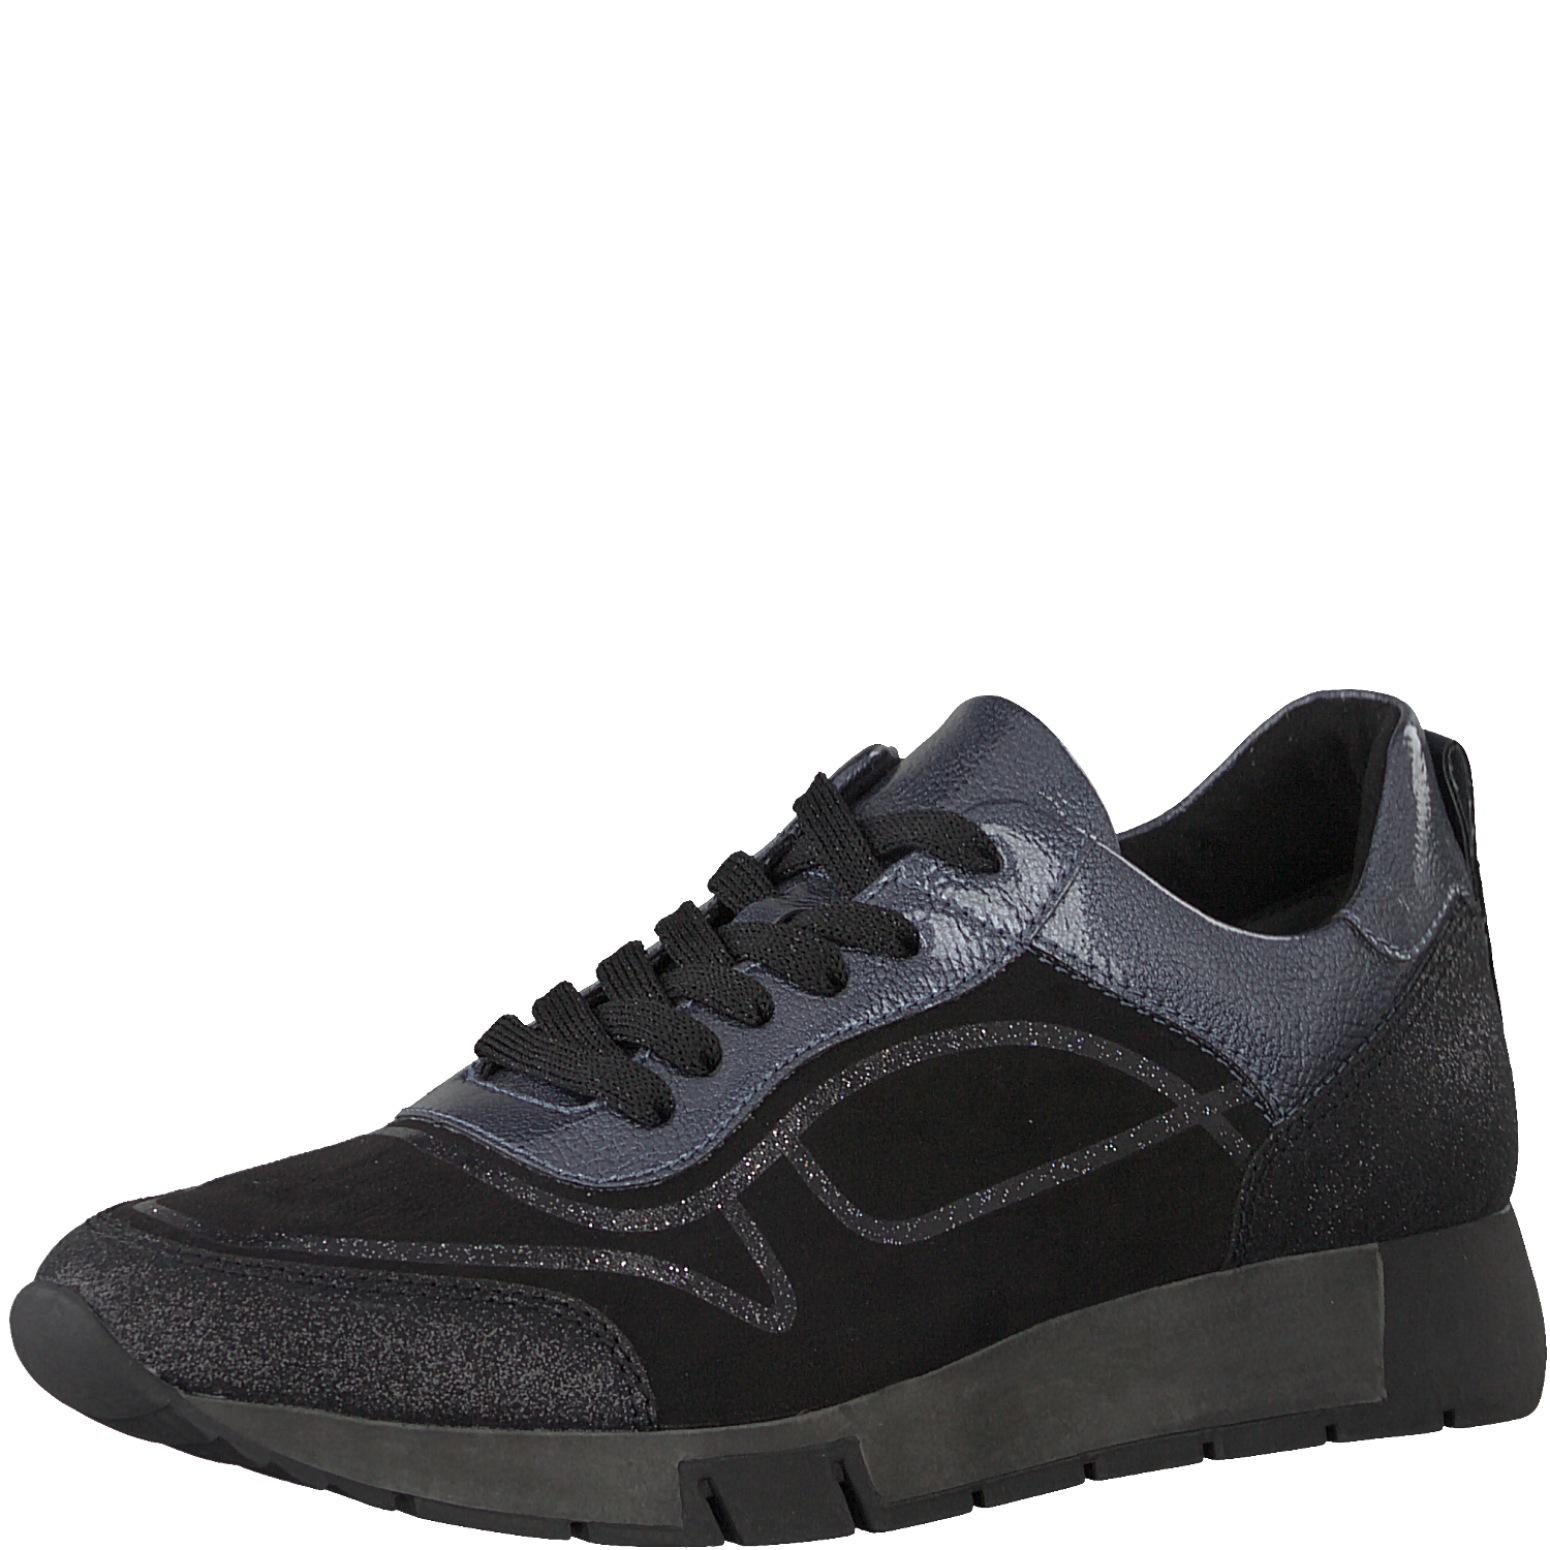 Tamaris Damen Sneaker 1-23718-29-098 schwarz kombi